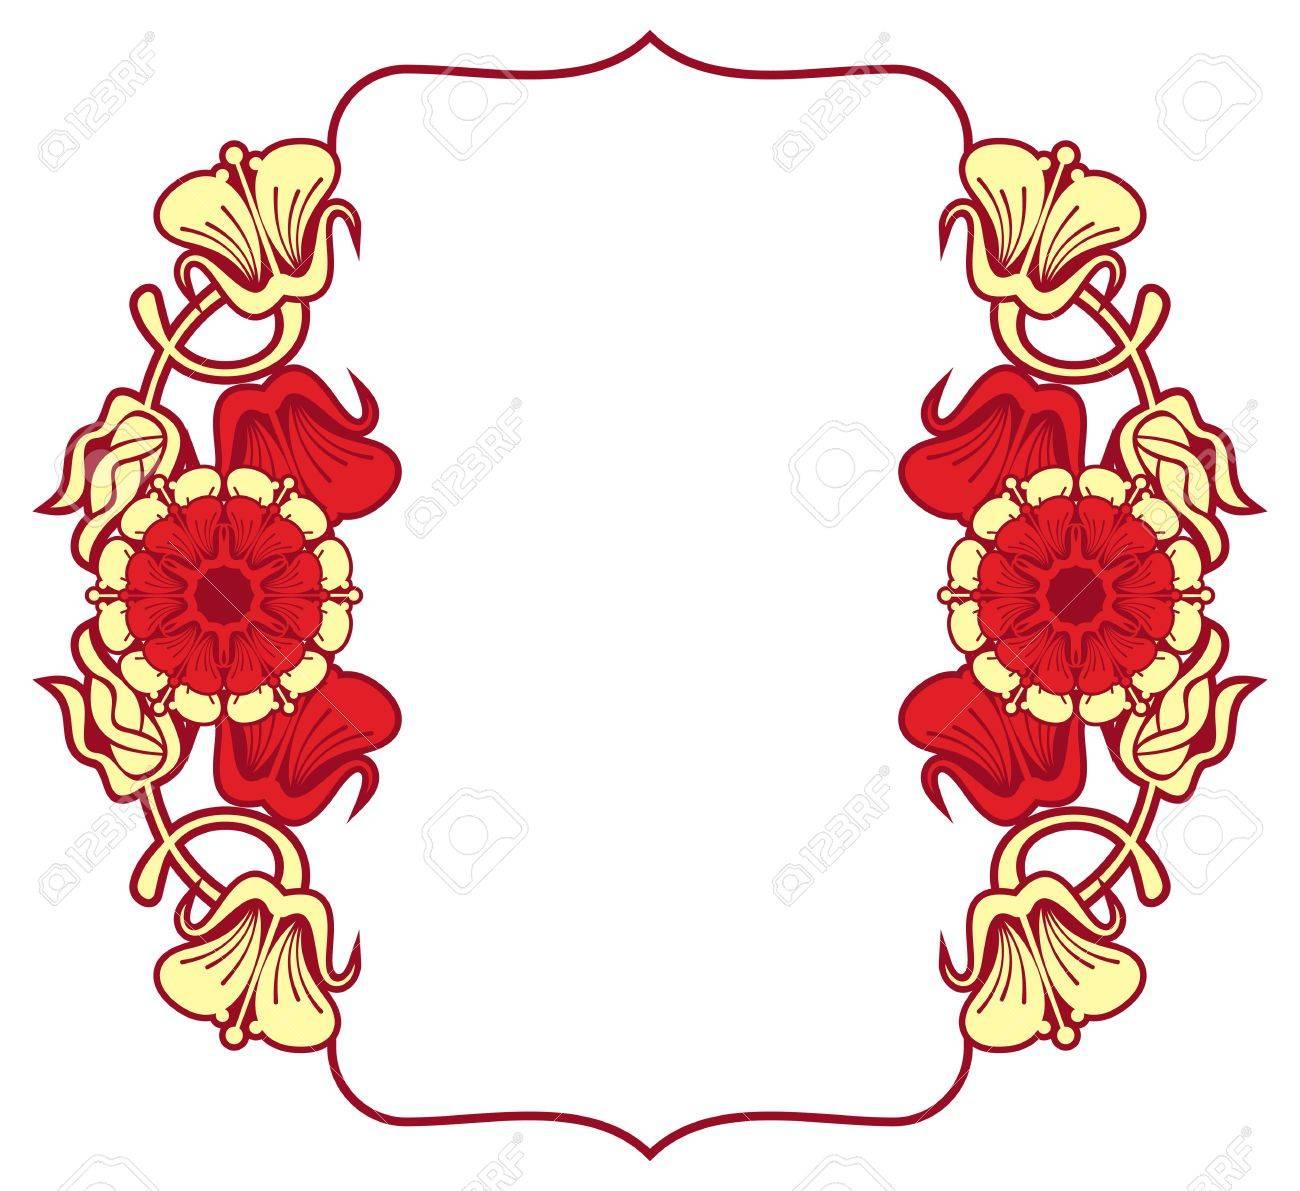 Red Wedding Invitation Clip Art Designs - Clipart Vector Design •